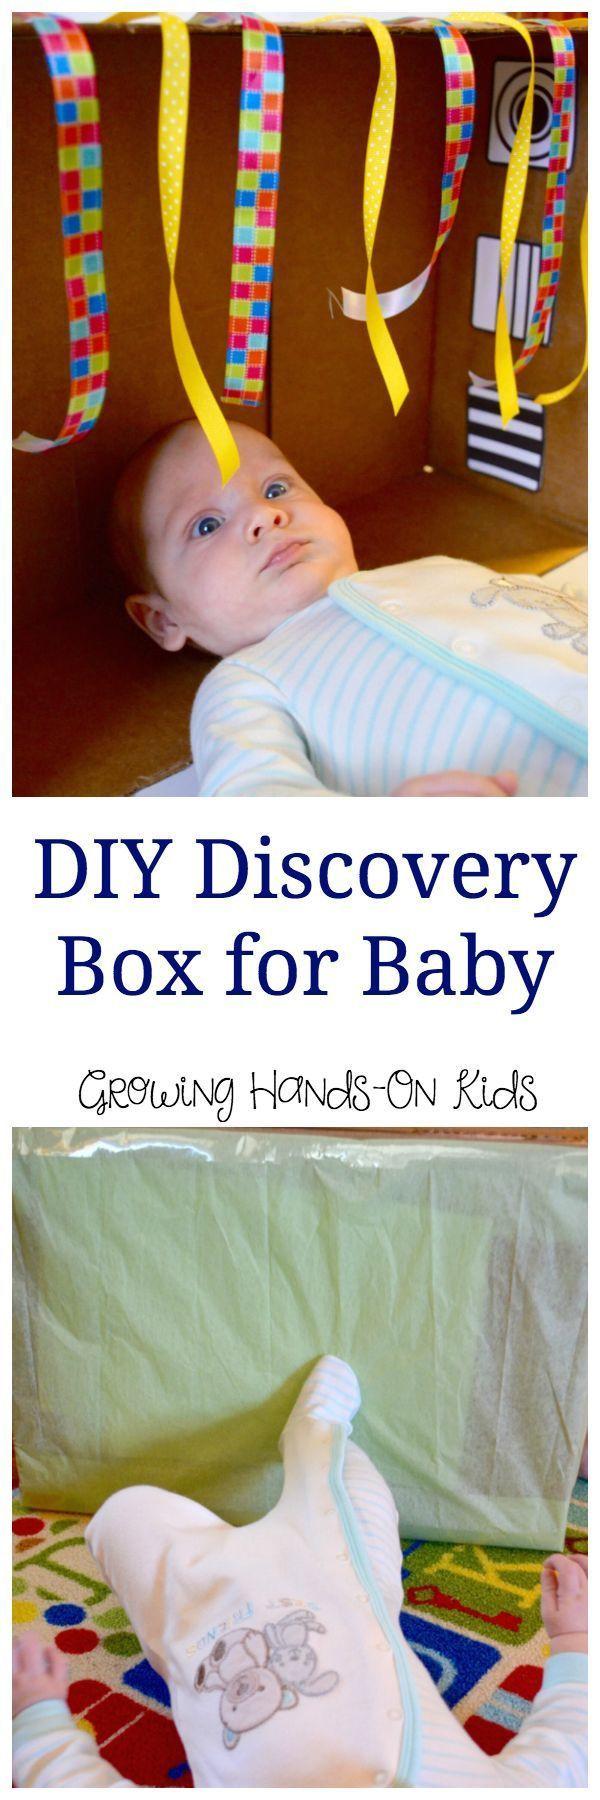 DIY Baby Box  DIY Discovery Box for Baby